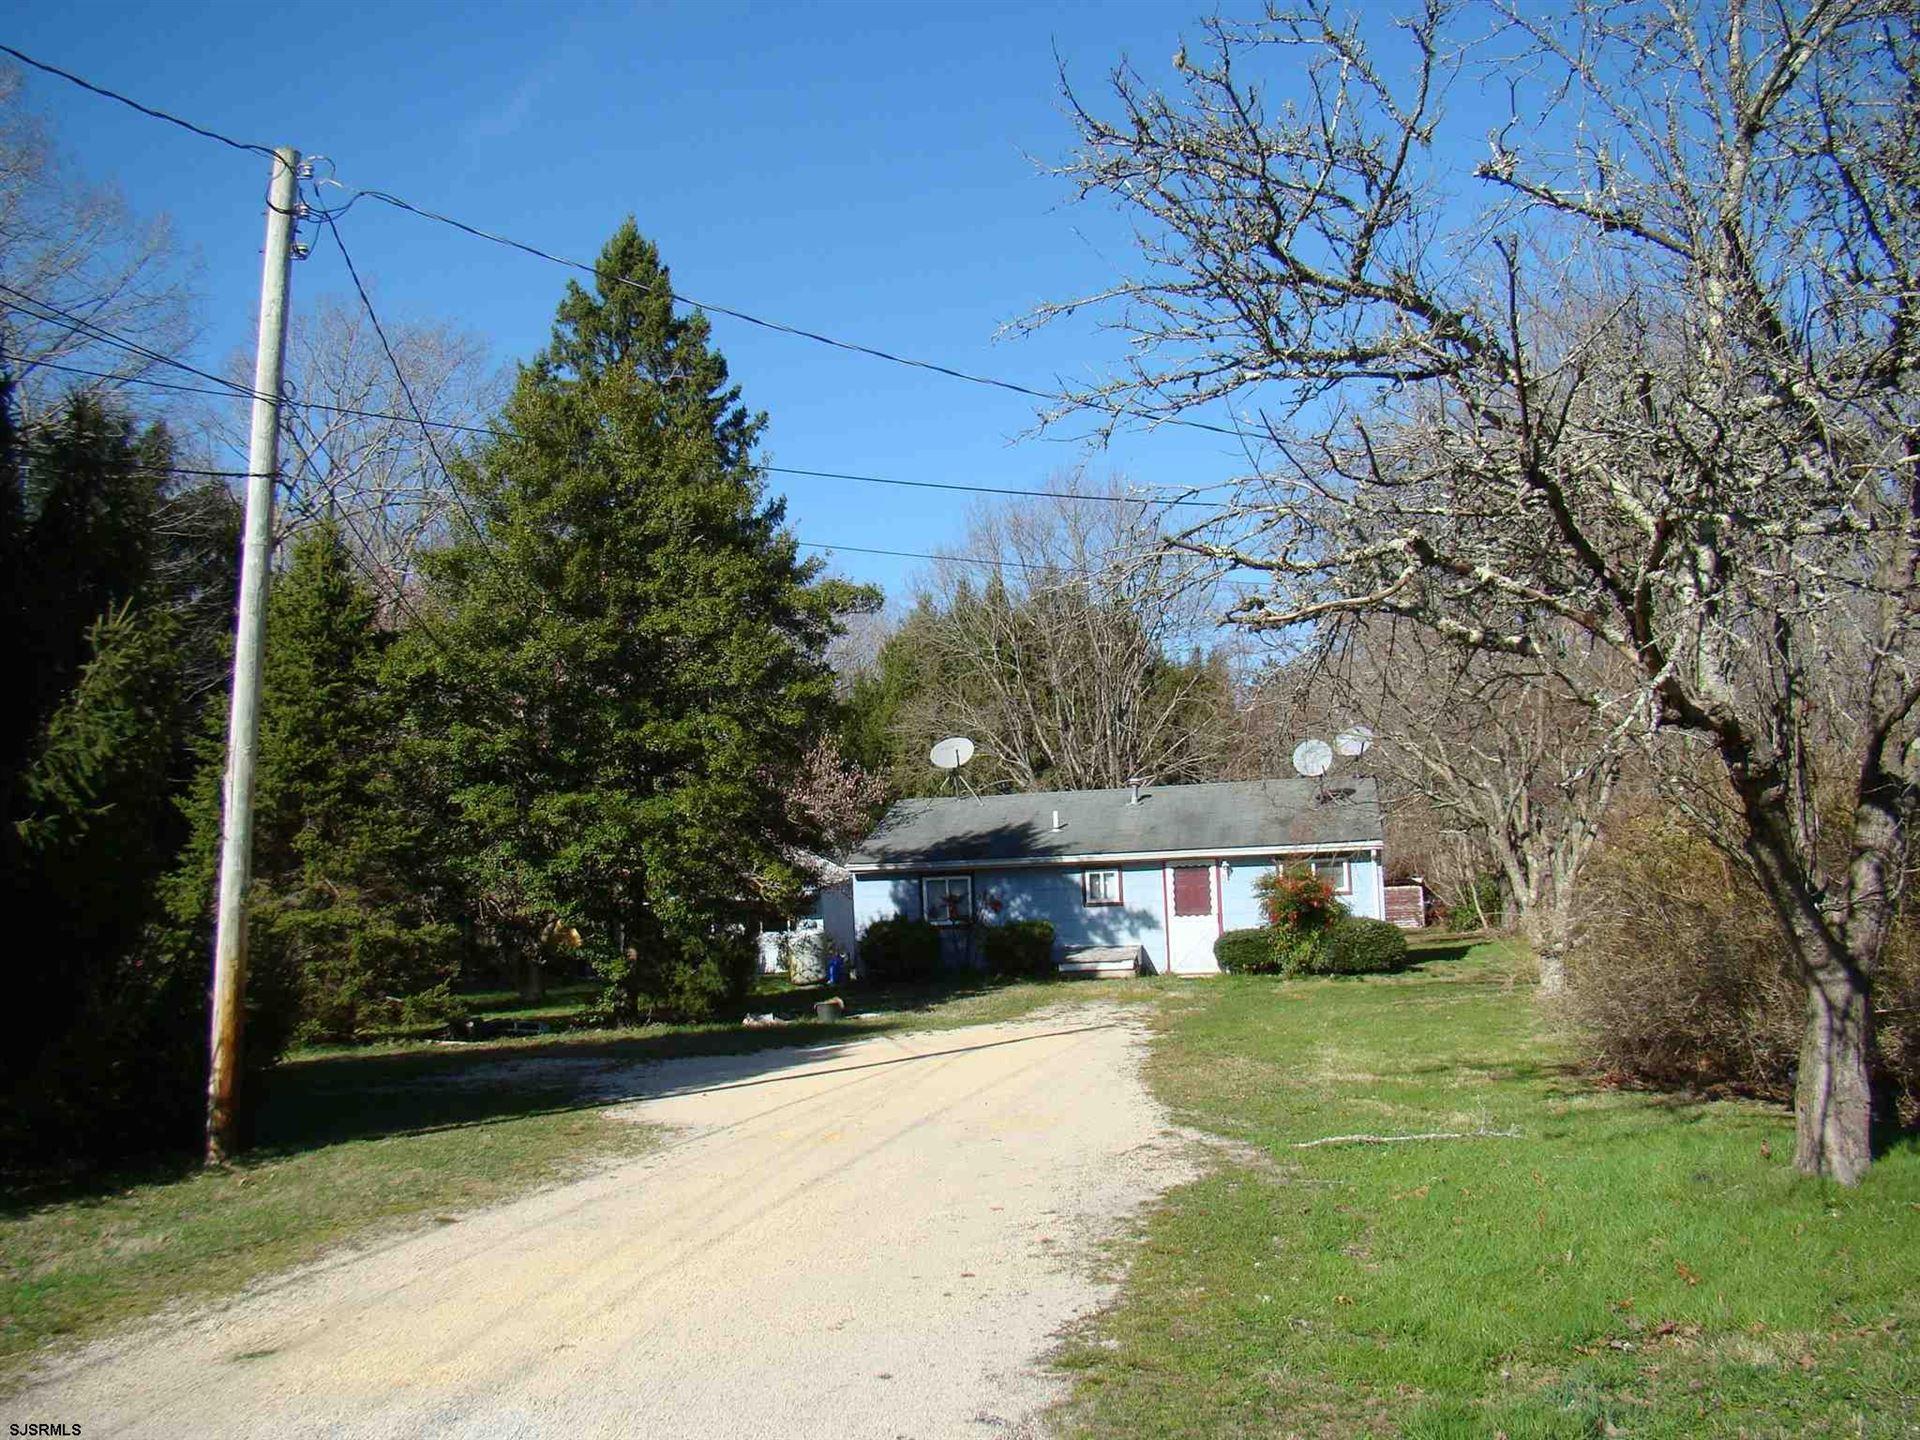 4948 Moss Mill Rd Road, Egg Harbor City, NJ 08215 - #: 549000